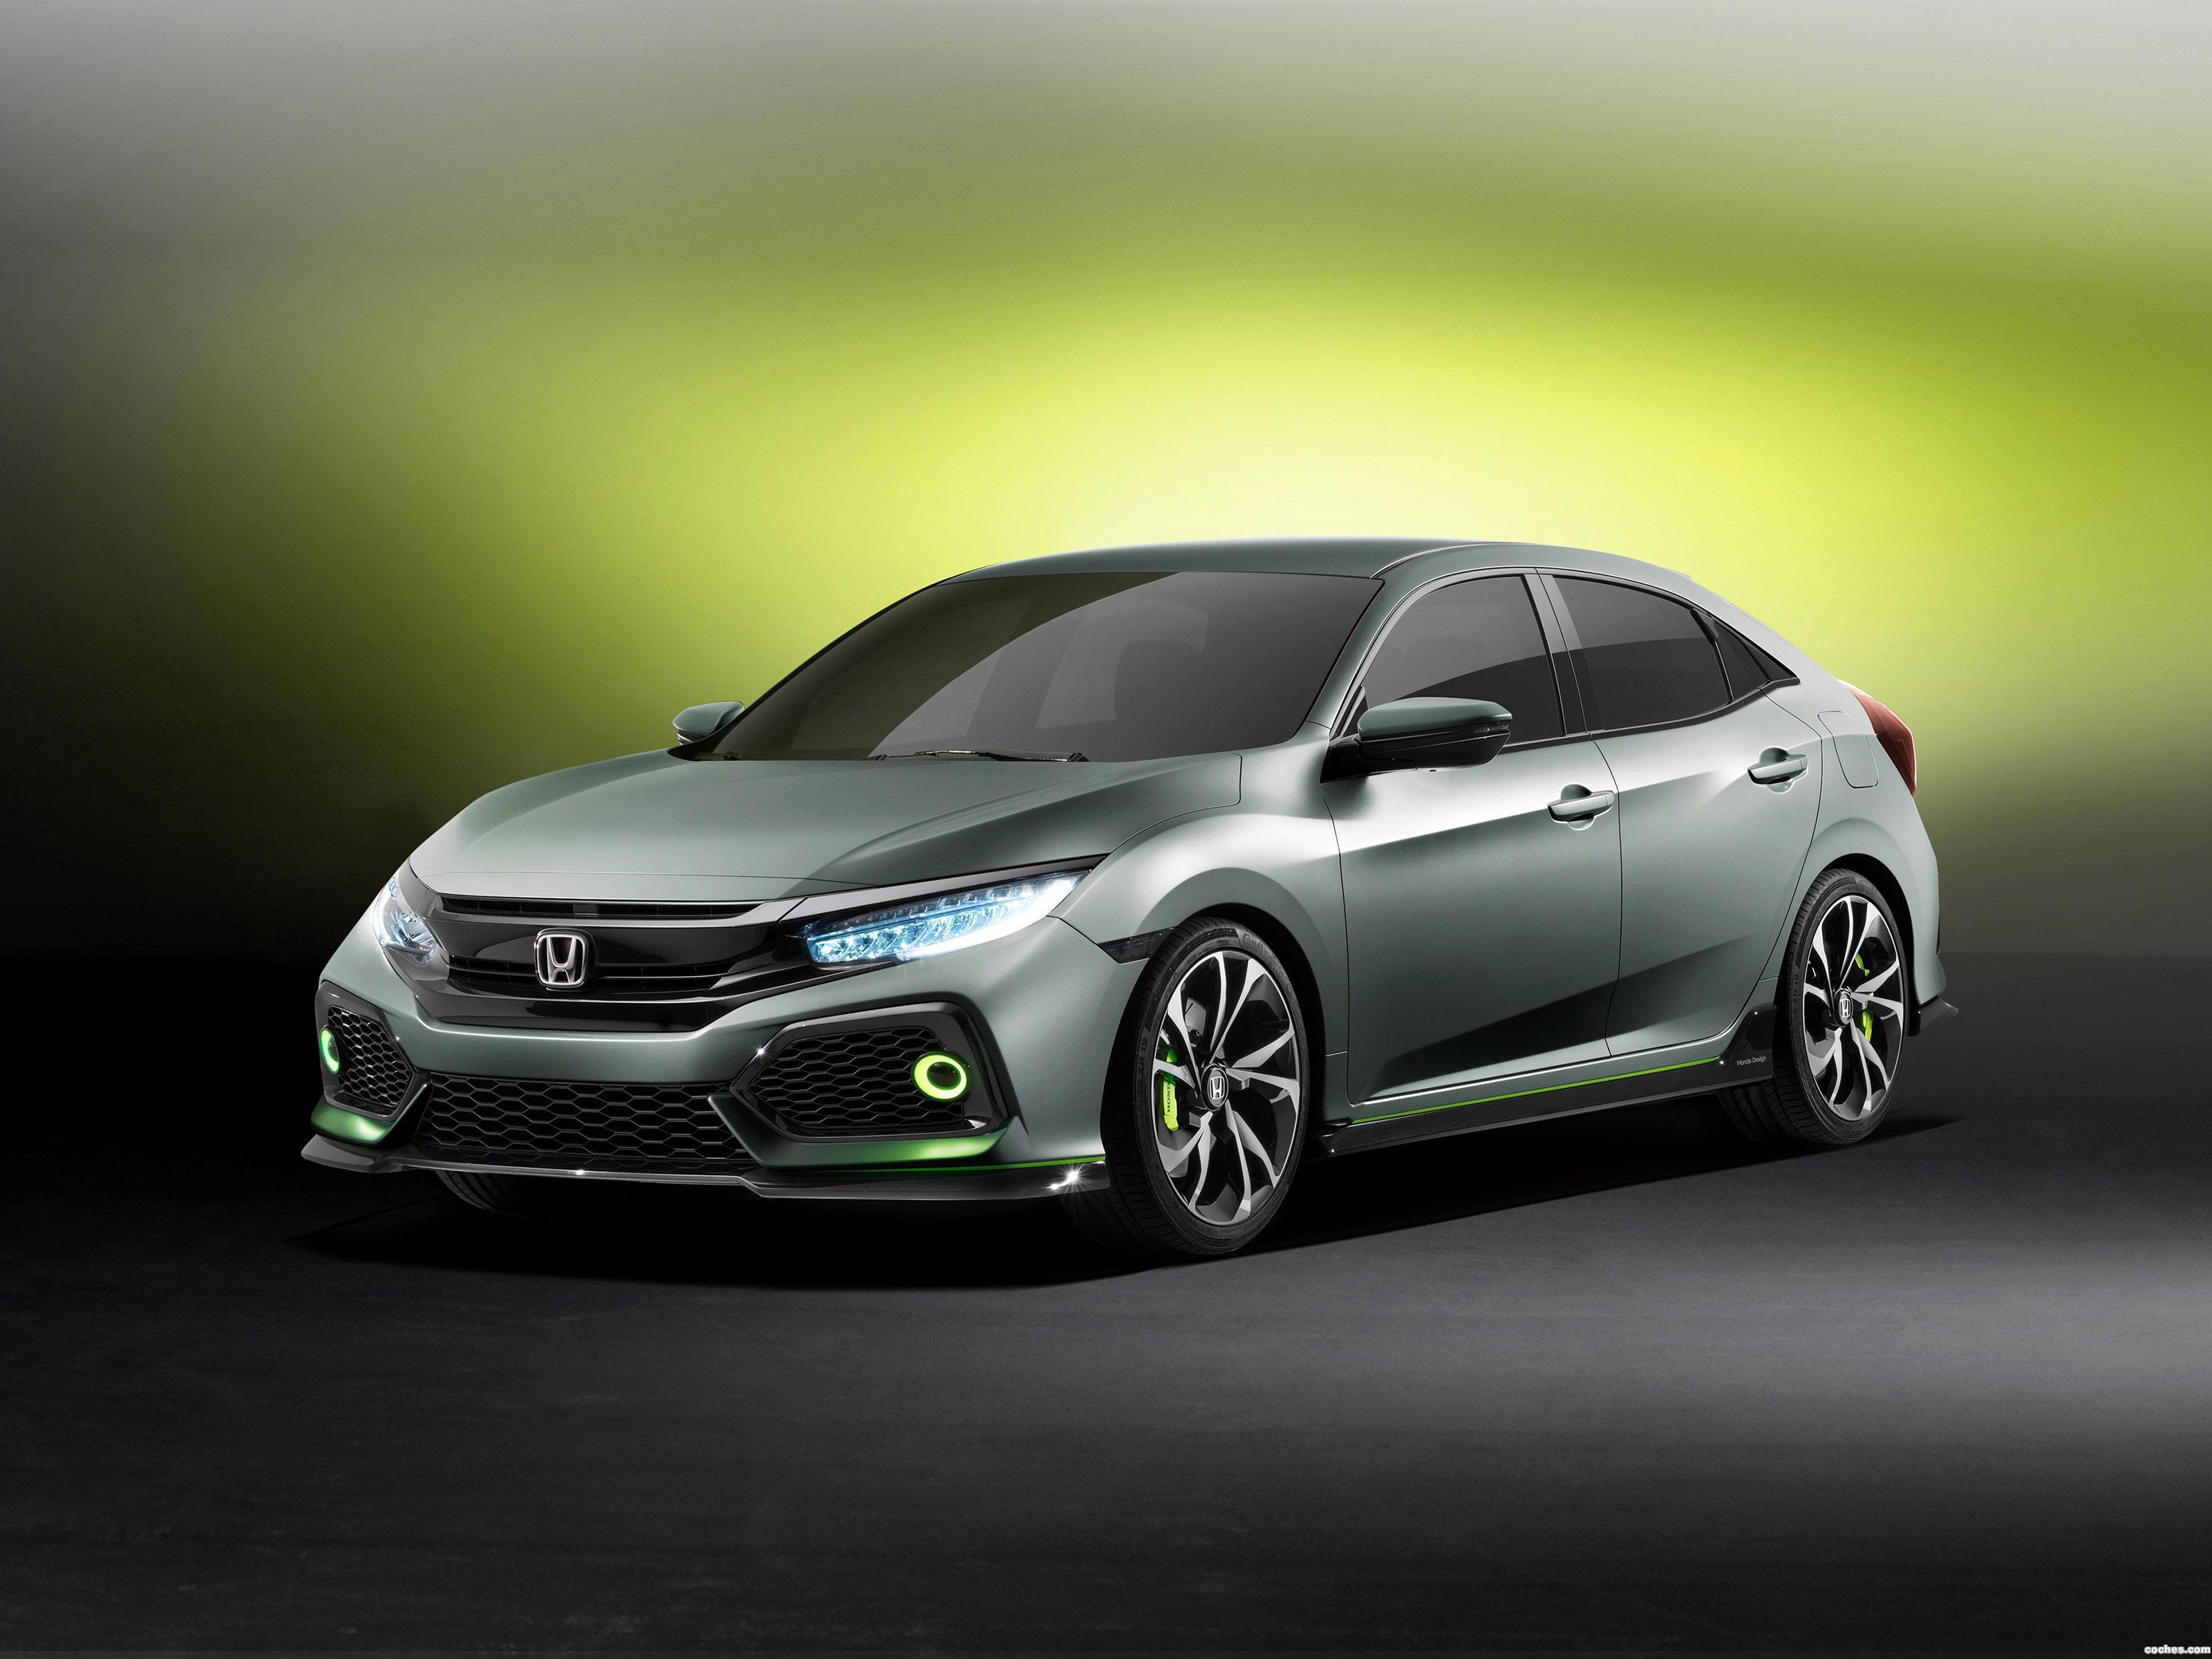 Foto 0 de Honda Civic Hatchback Concept 2016